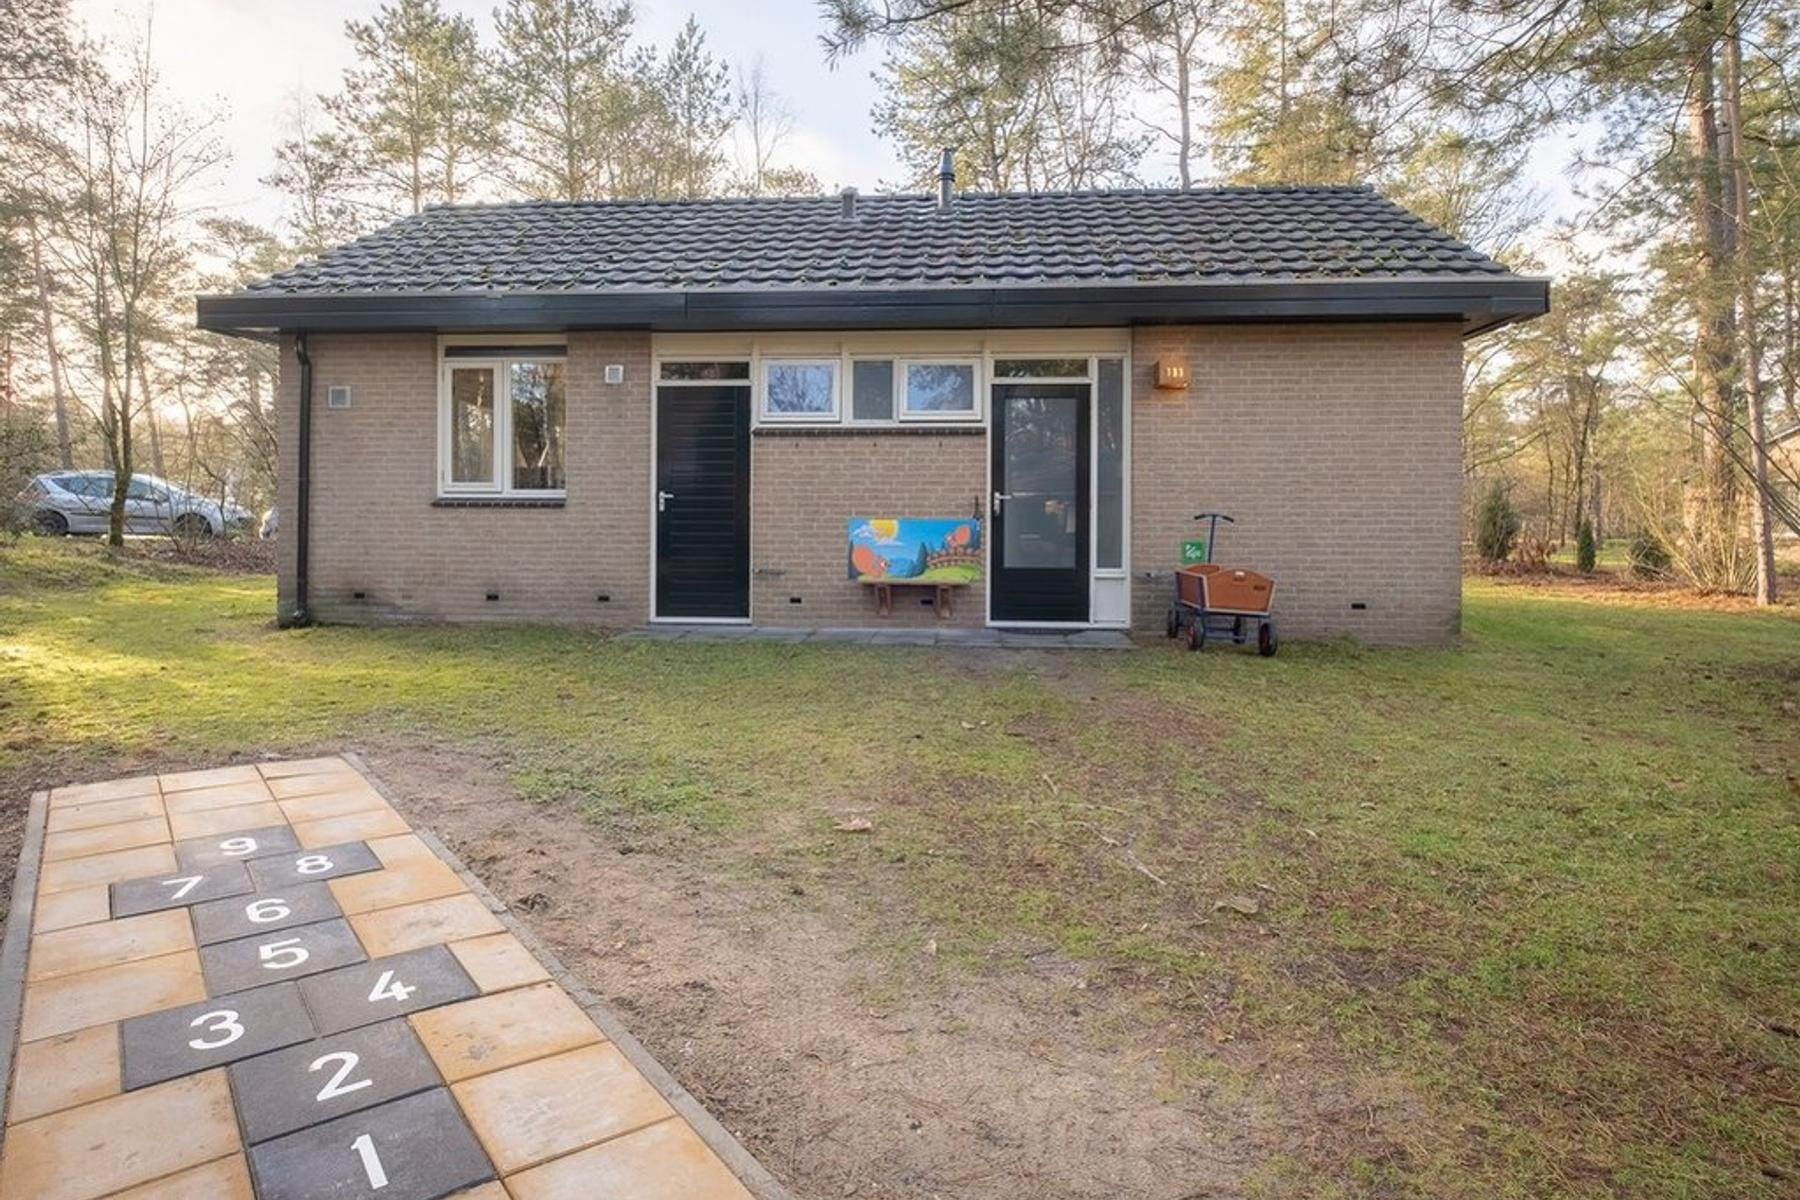 Boshoffweg 6 258 in Eerbeek 6961 LD